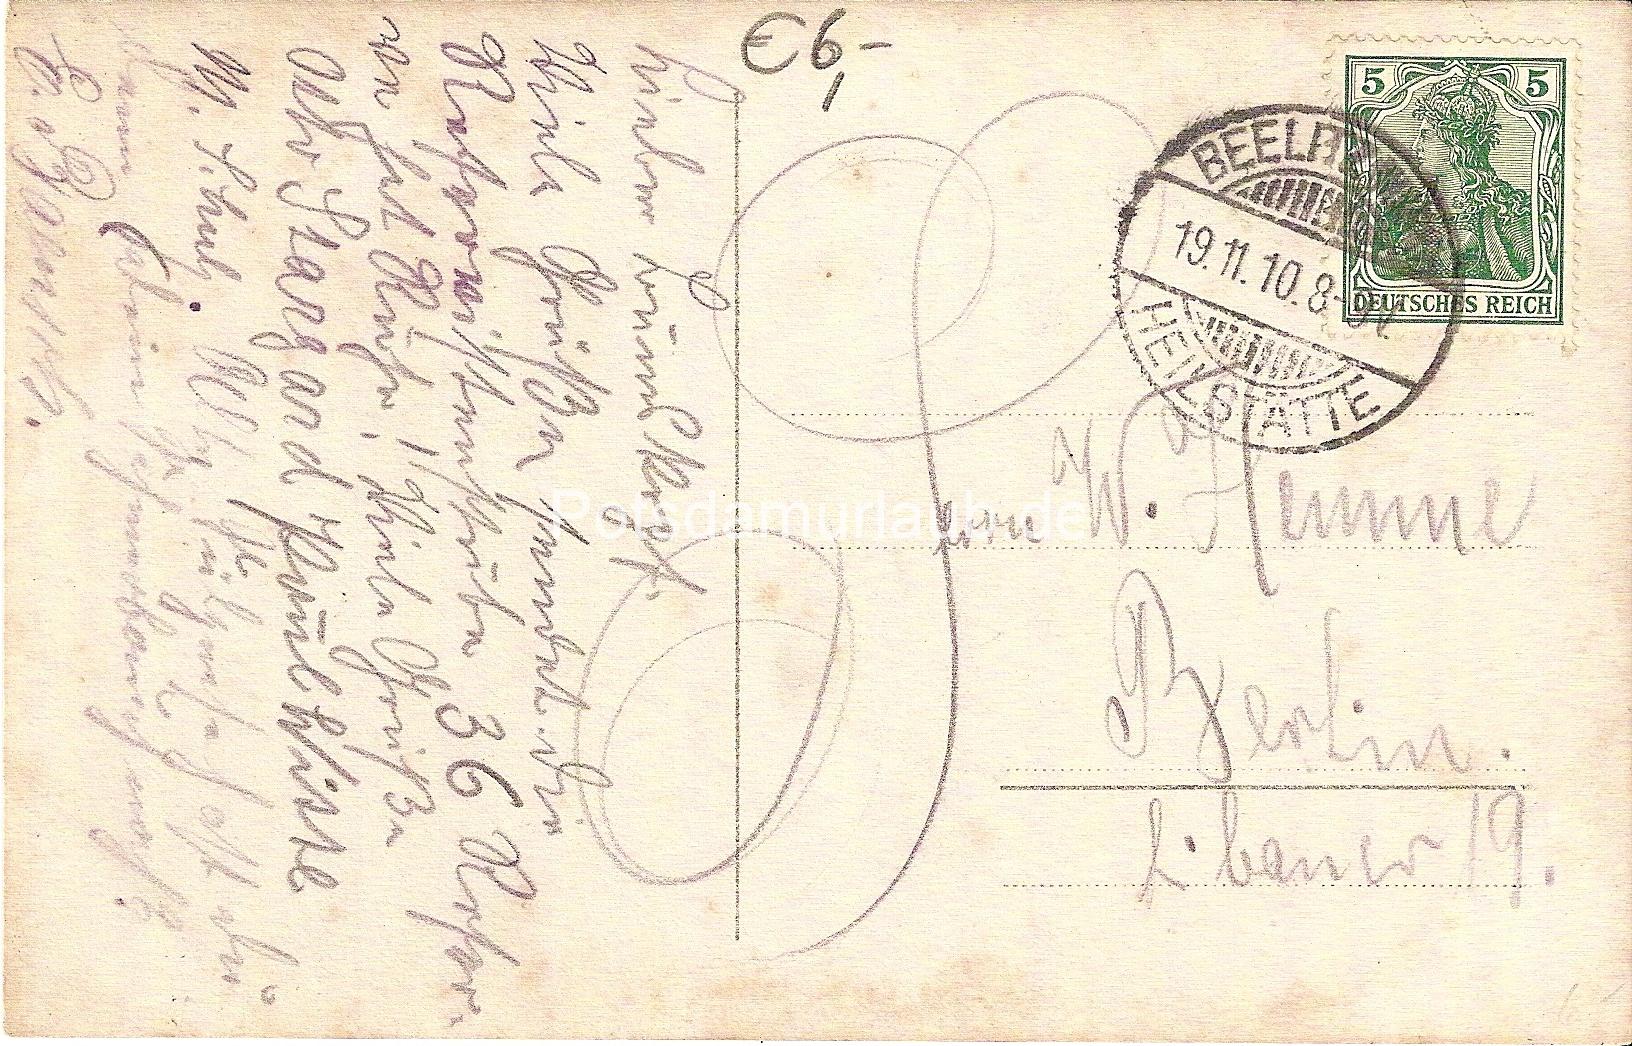 1910 11 19